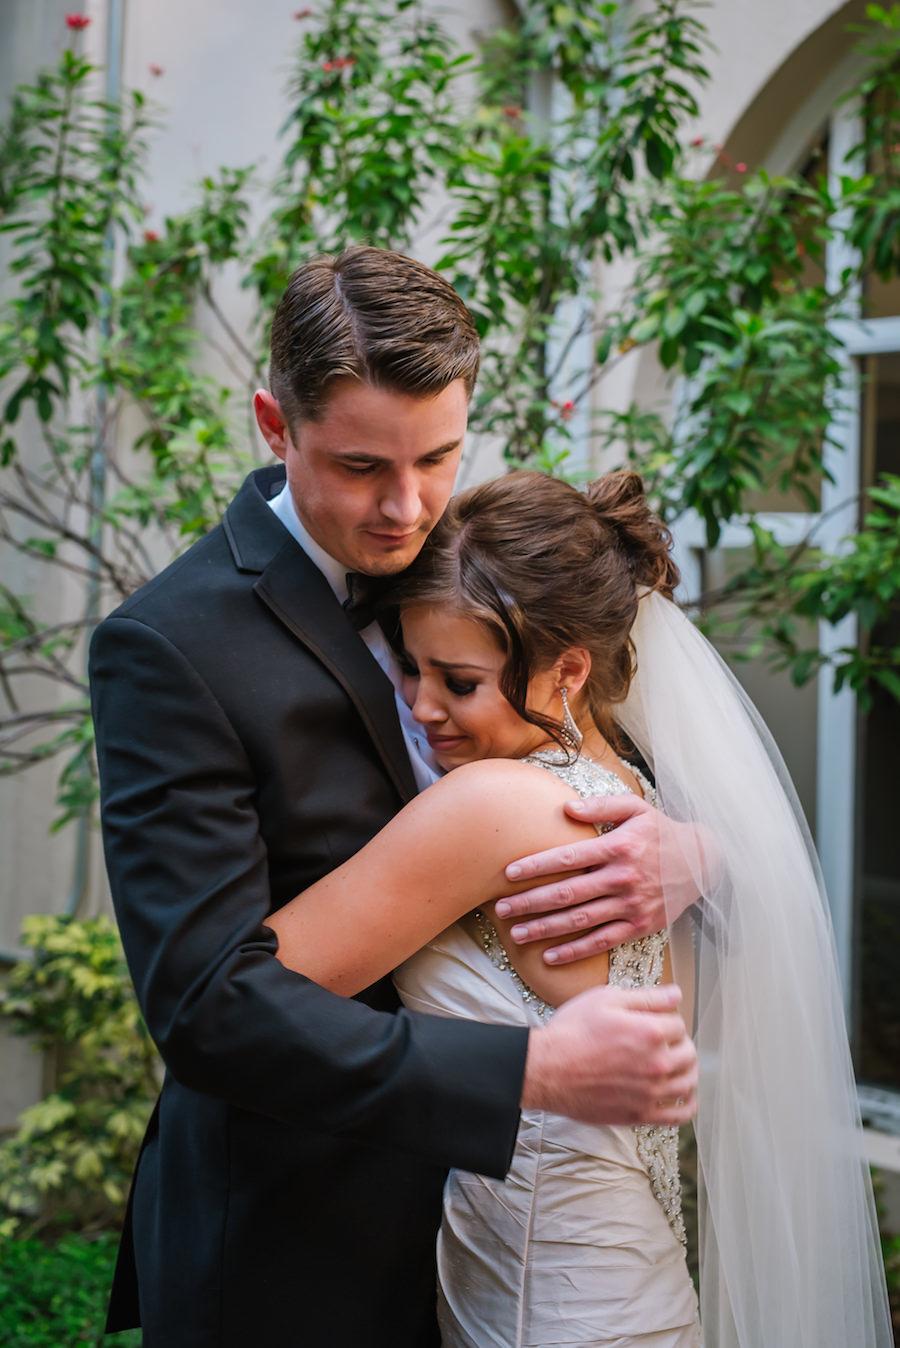 Bride and Brother Wedding Portrait | Martina Liana Ivory Satin Wedding Dress | Tampa Wedding Hair Arist Michele Renee The Studio